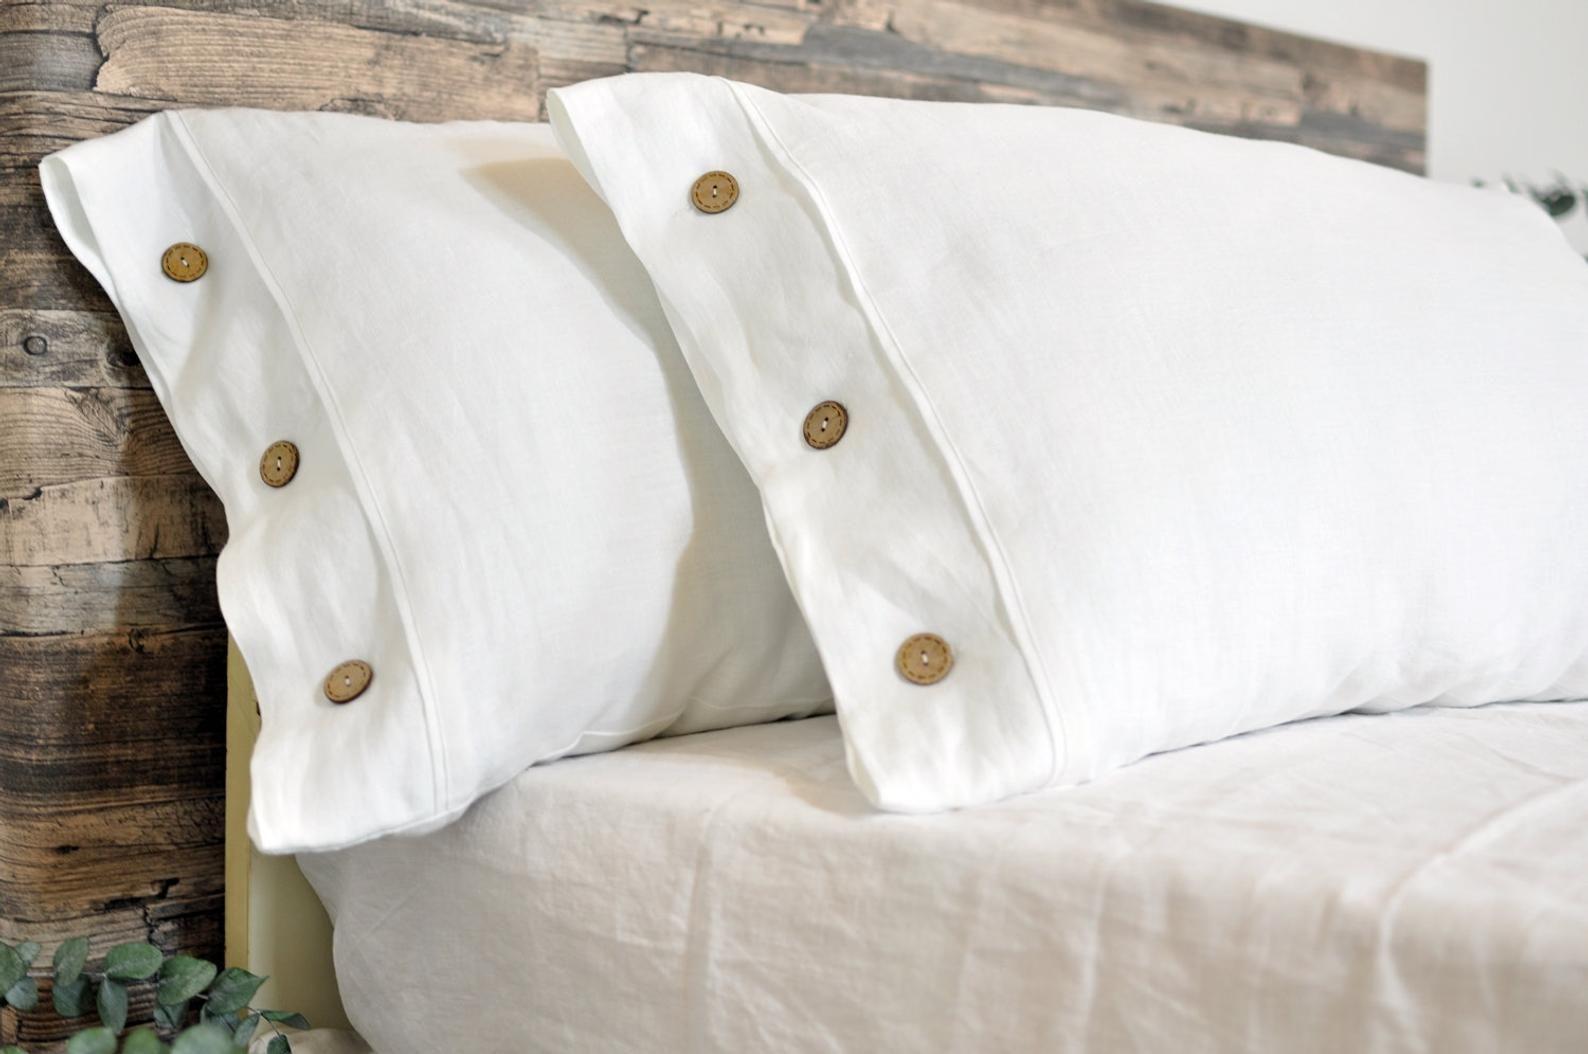 white linen pillowcase with button